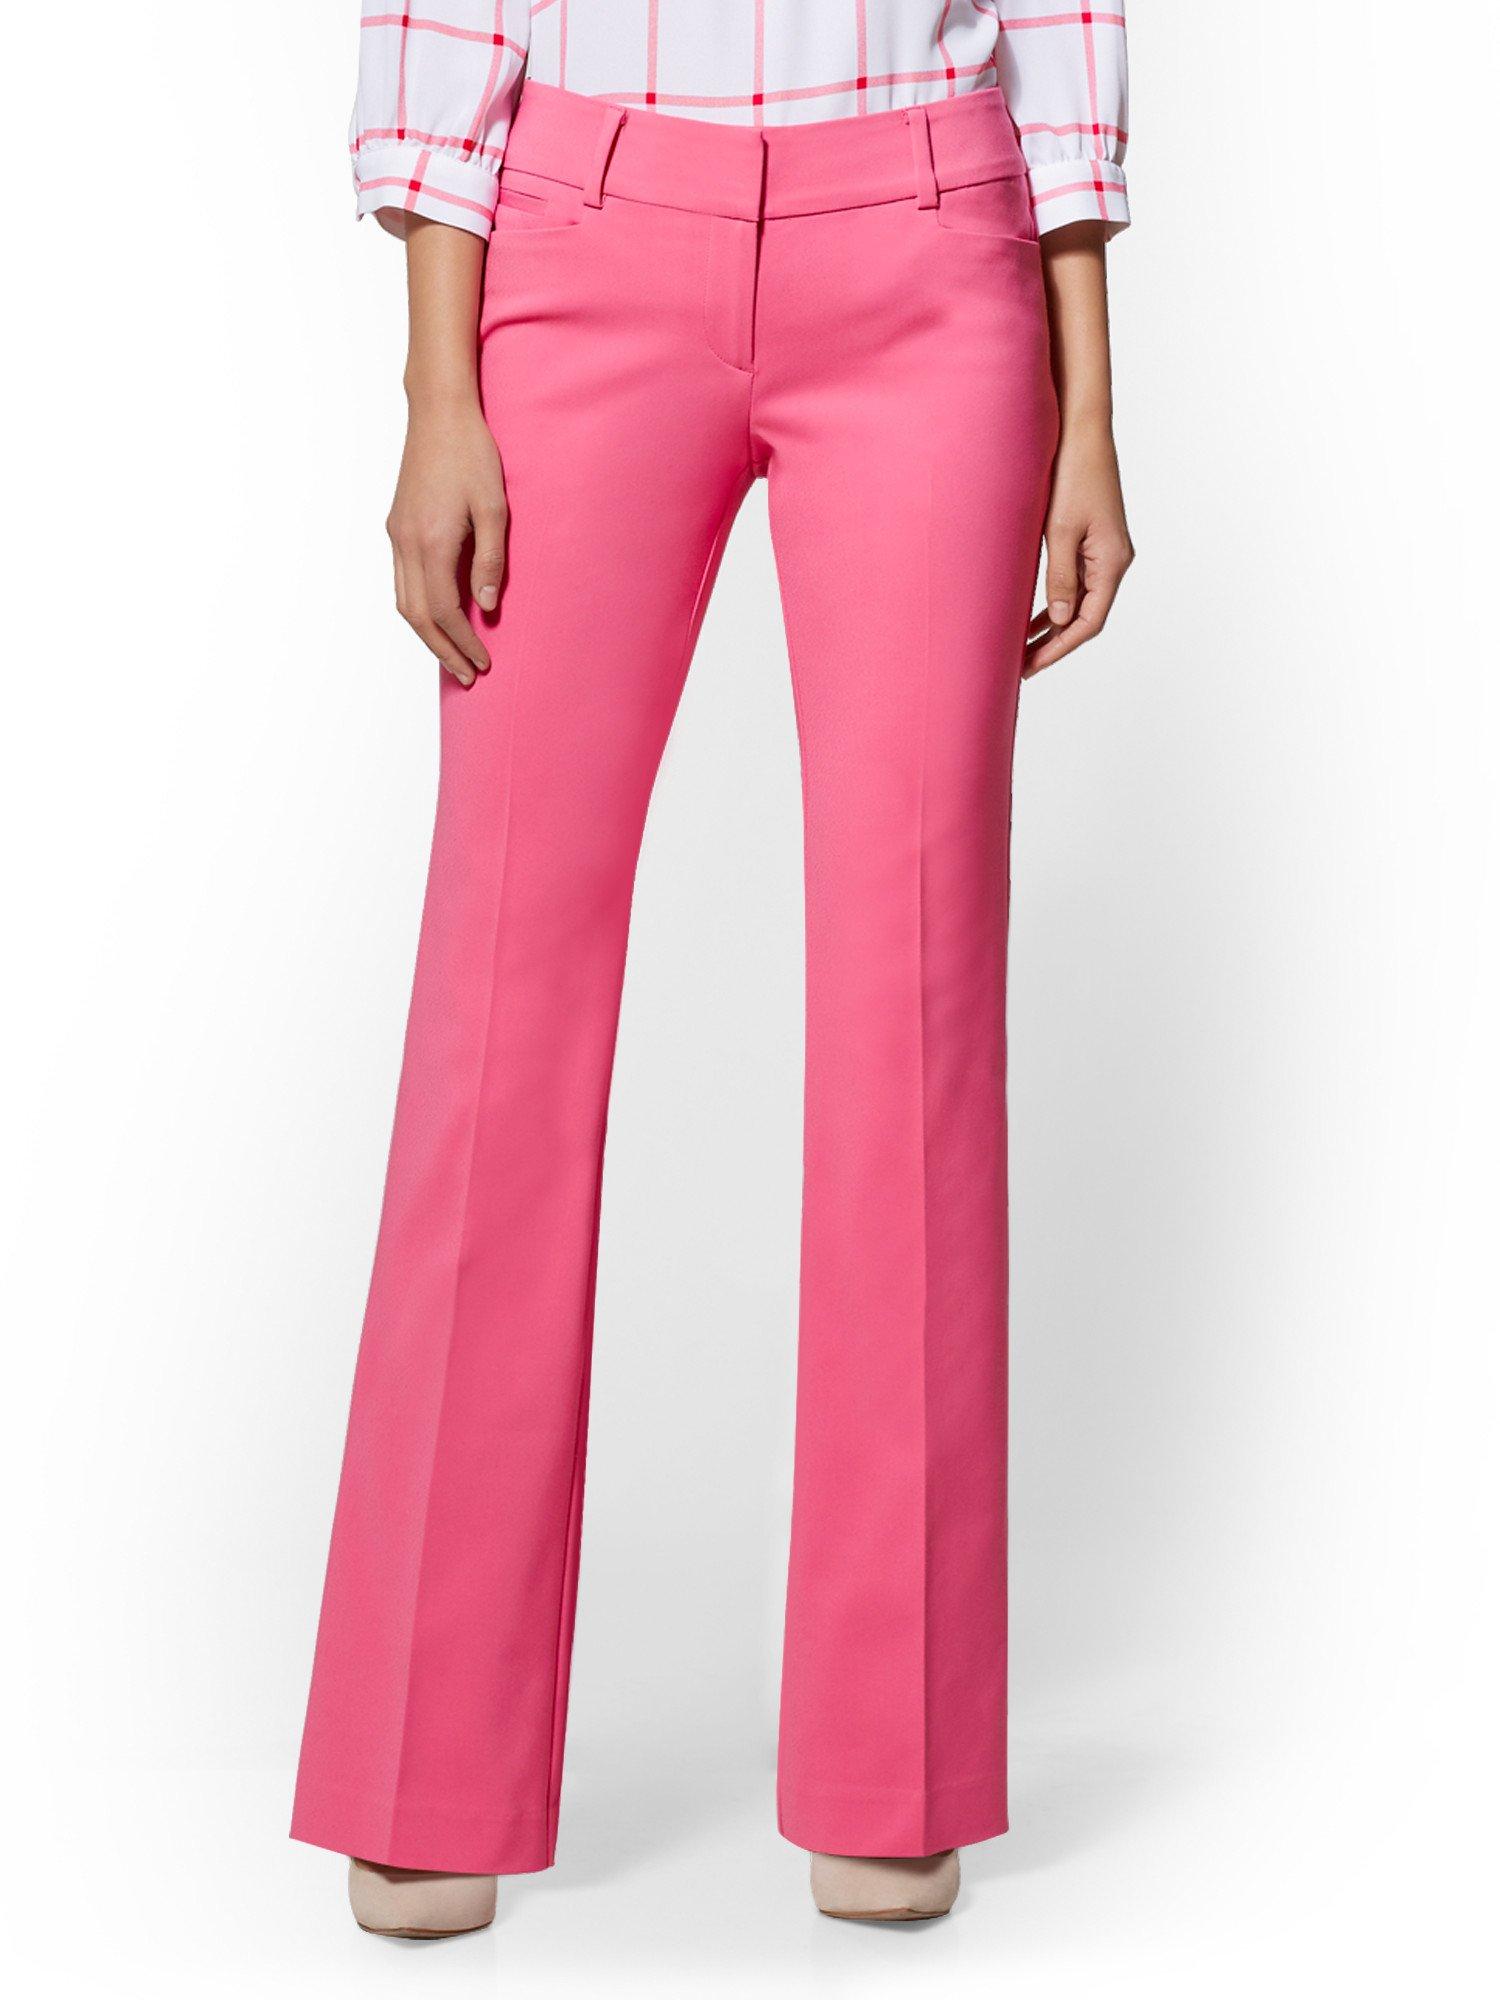 New York & Co. 7Th Avenue Petite Pant - Straight Leg 8 Pink Flamingo